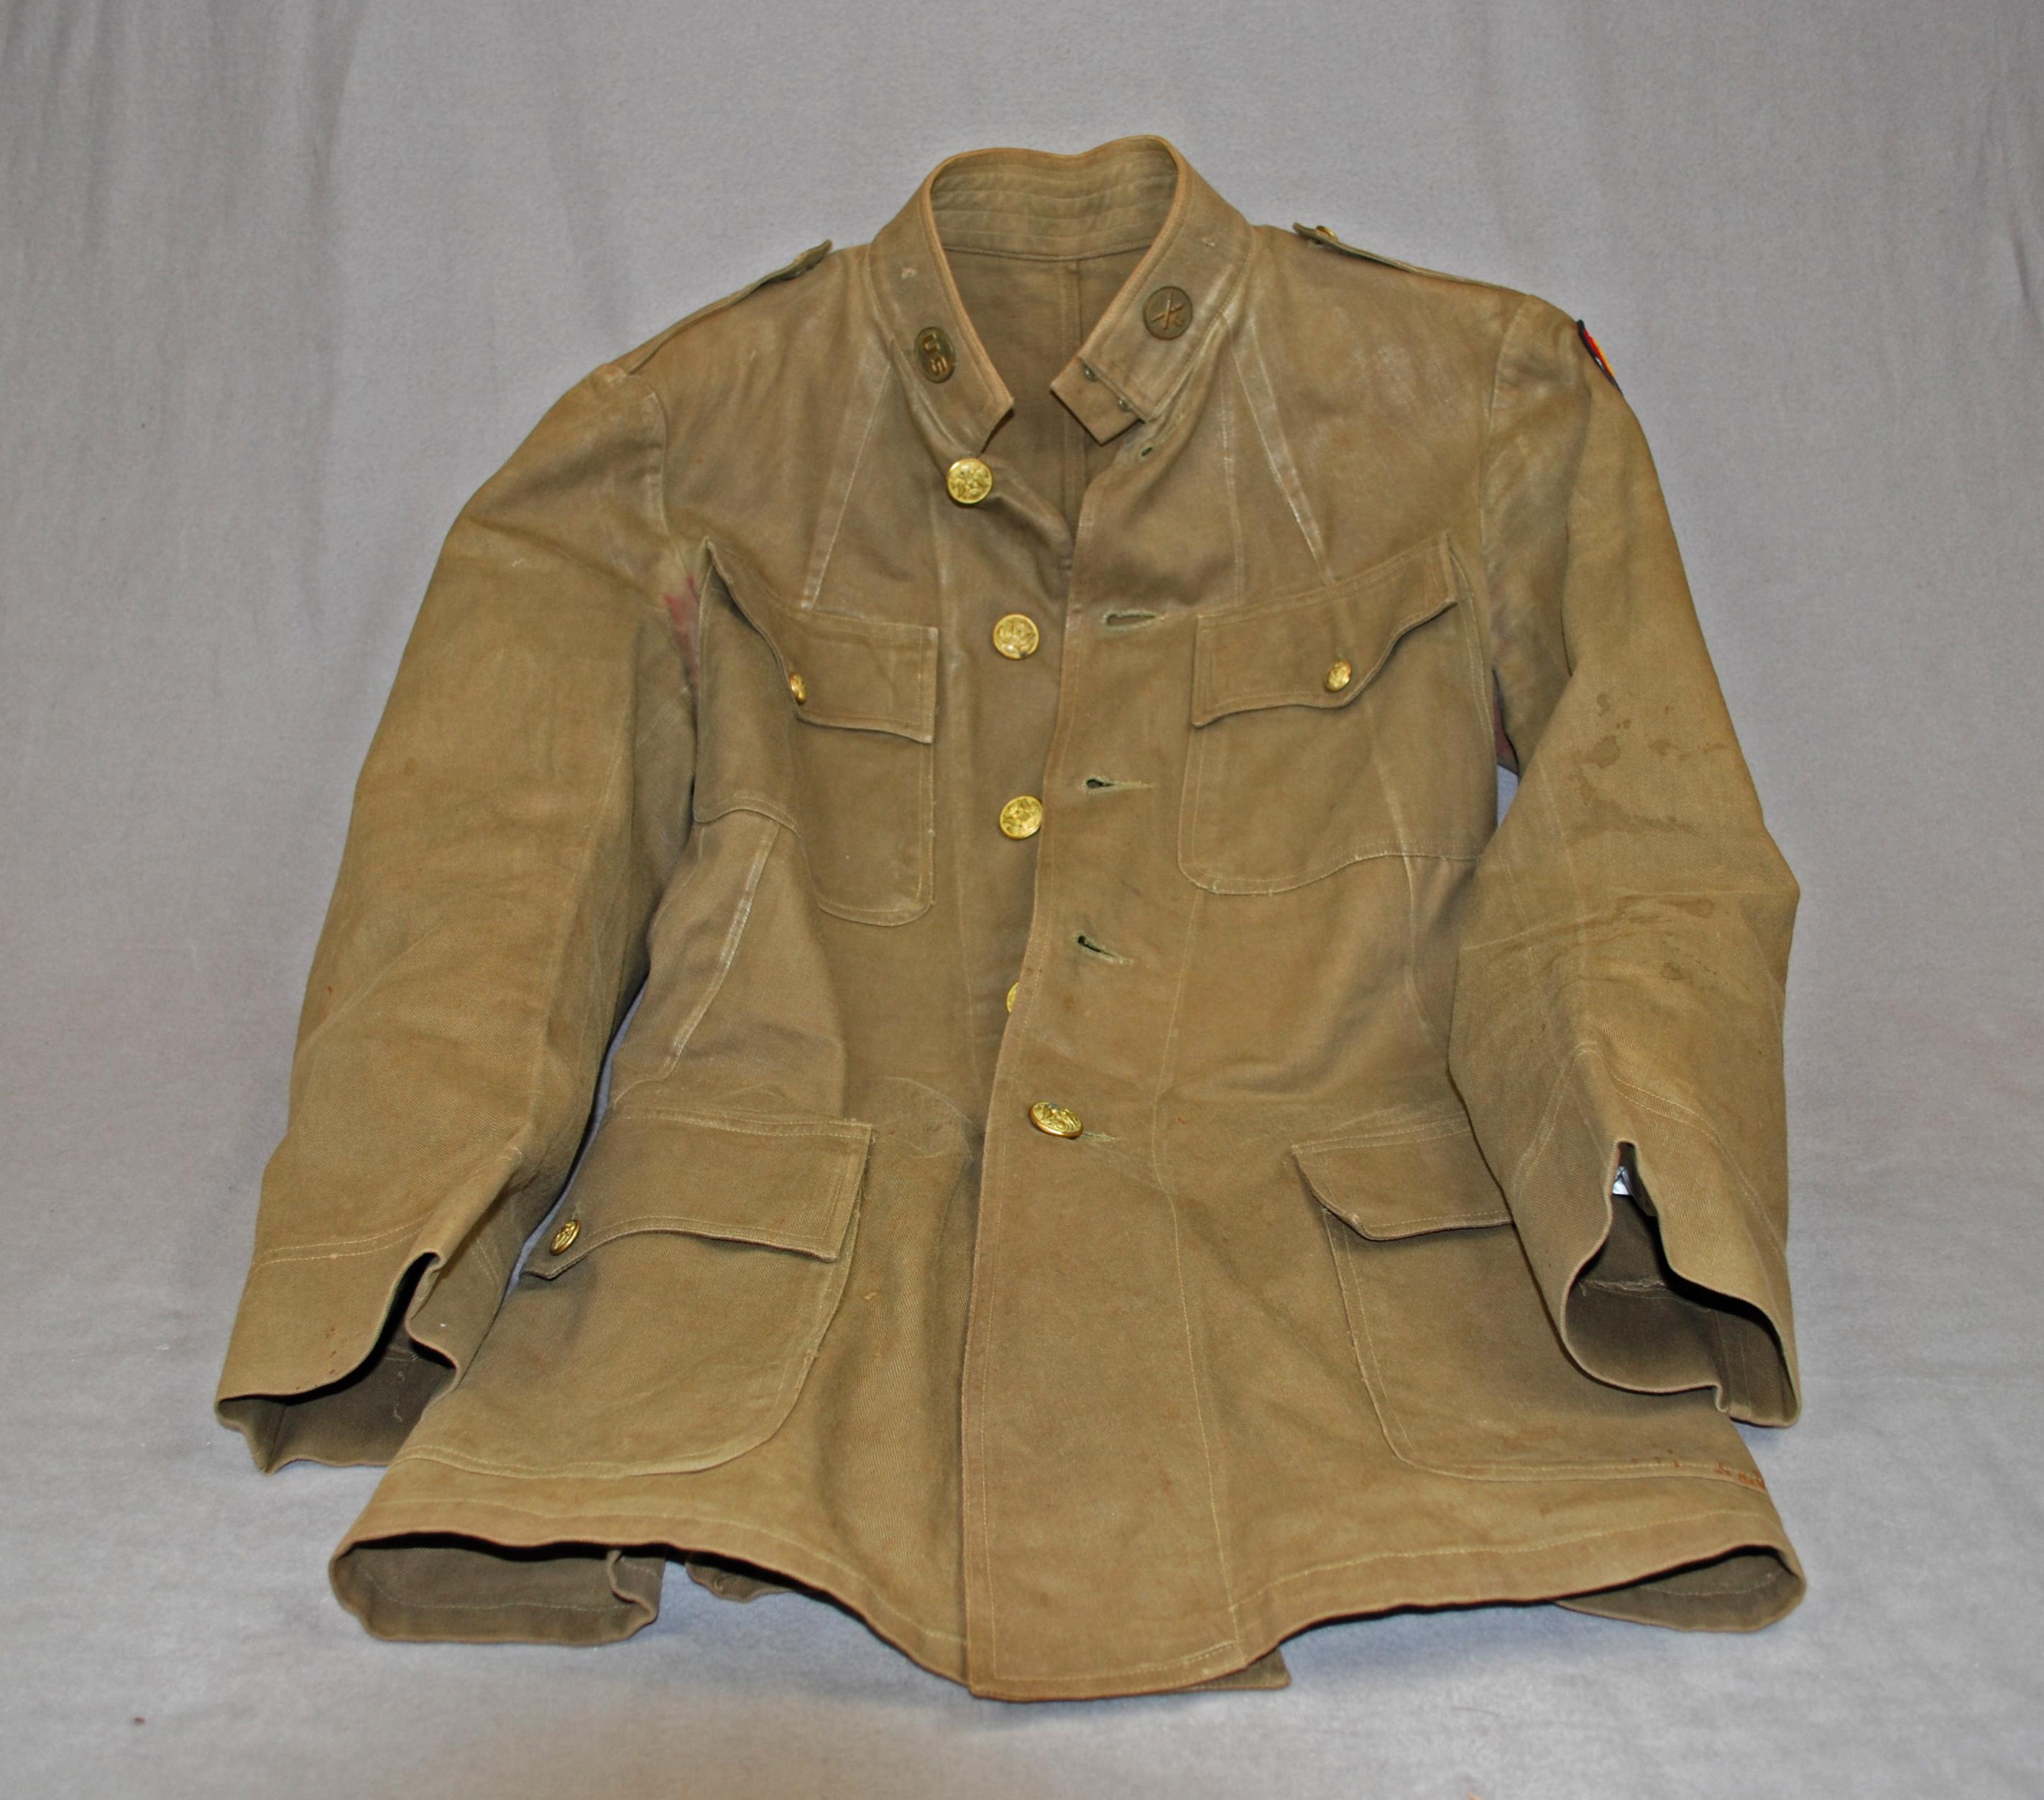 Object: Jacket (U.S. Army) | UTSA Institute Of Texan Cultures